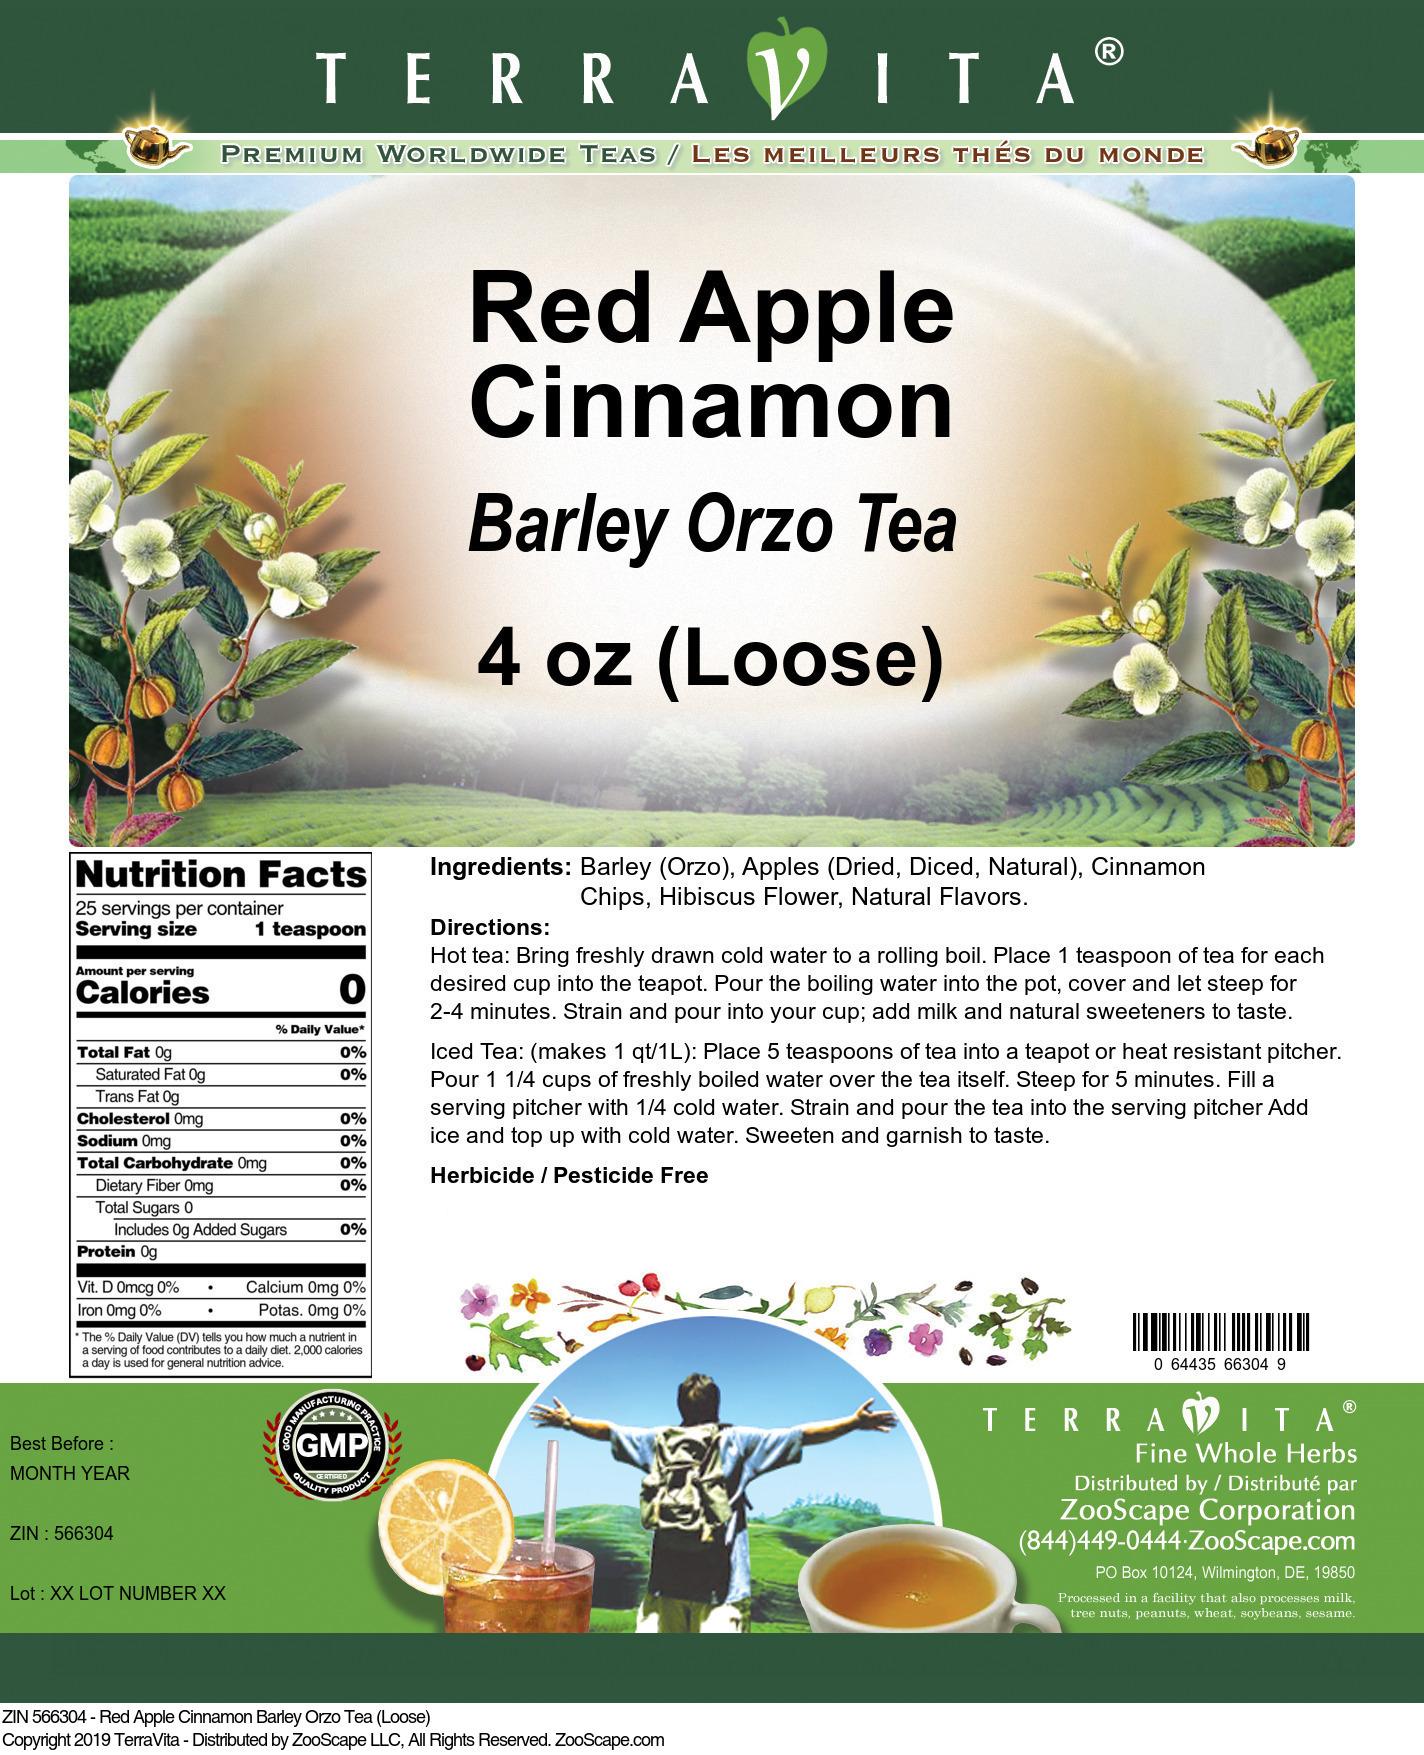 Red Apple Cinnamon Barley Orzo Tea (Loose)